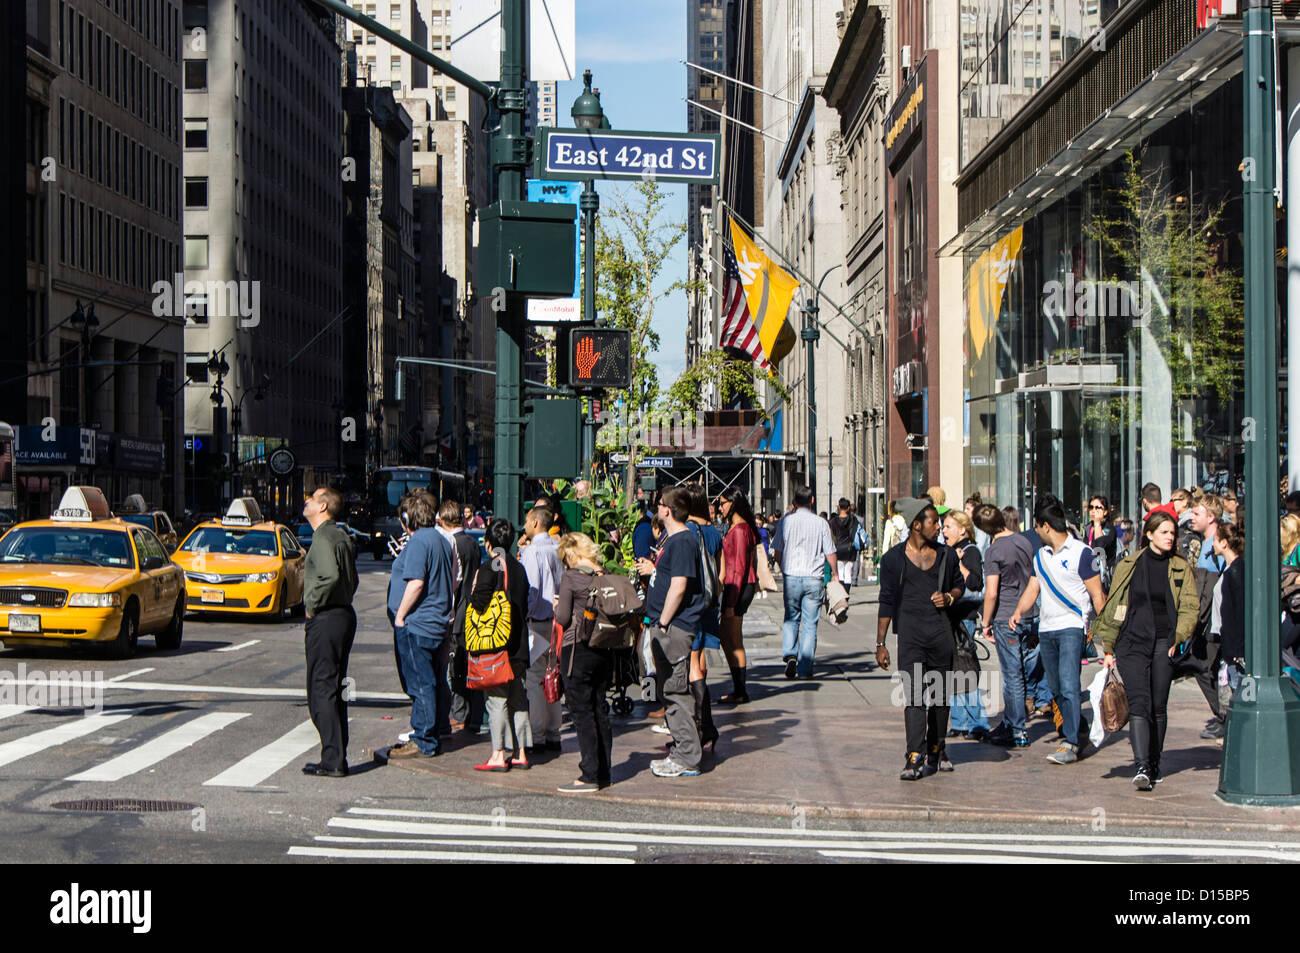 Street scene East 42nd Street, Mitwon Manhattan, New York City - Stock Image